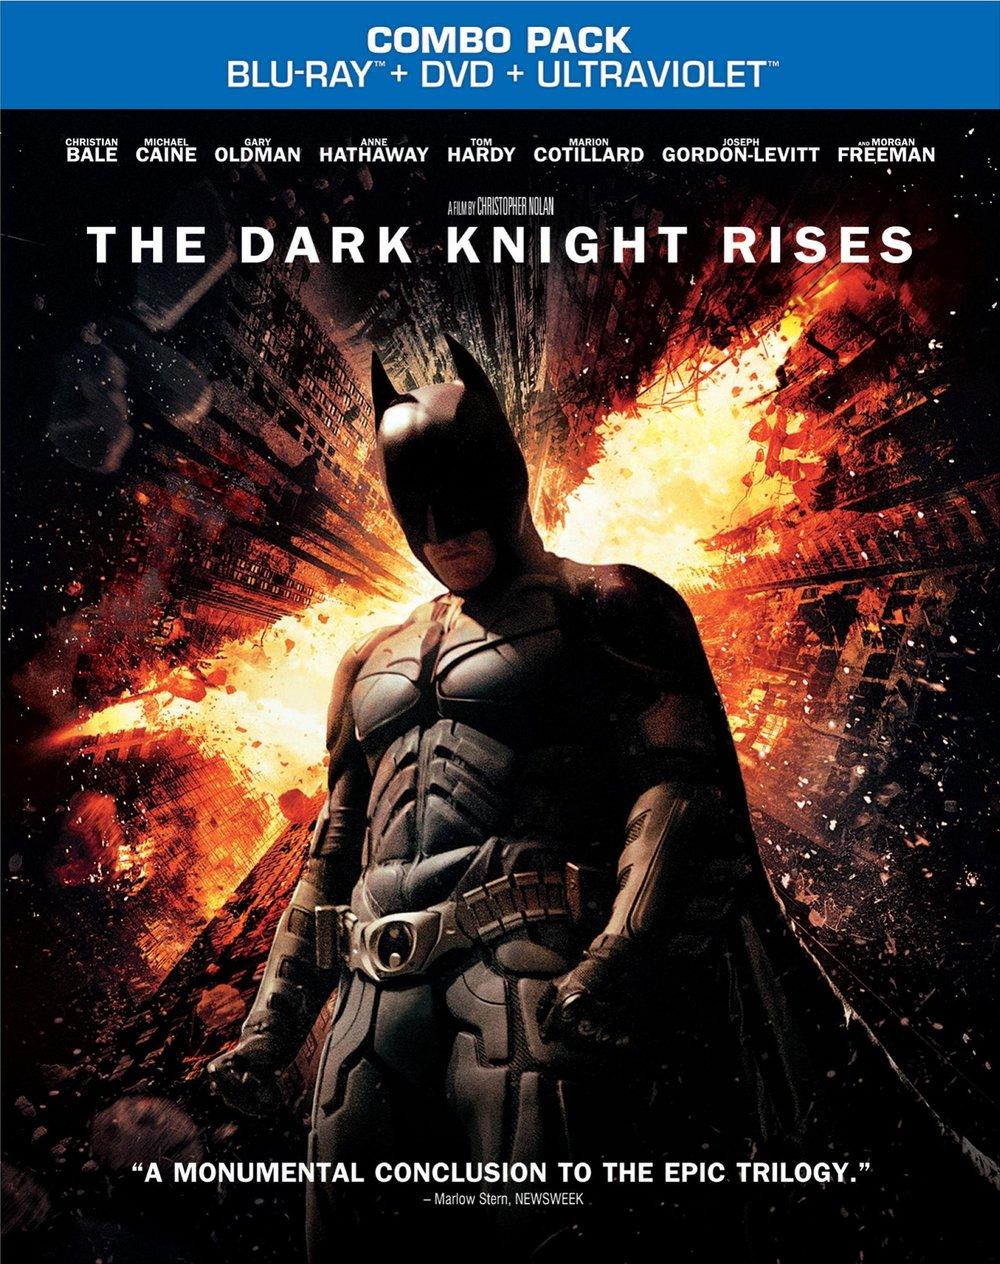 Dark-knight-rises-blu-ray-cover.jpg